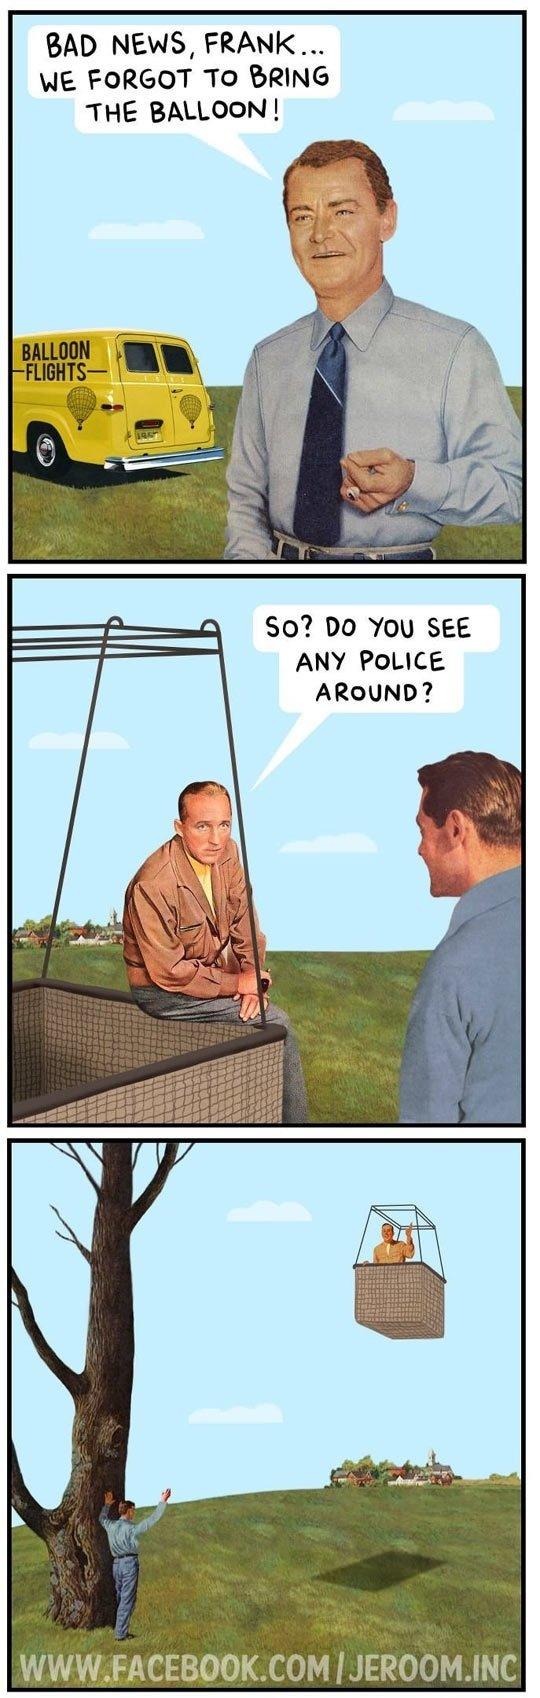 bad news, frank... . BAD NEWS, FRANK... NE FORGOT To URINE THE BALLOON! so? no You SEE ANY POLICE AROUND? rael ) ii Ili Ill tiill .lall, .